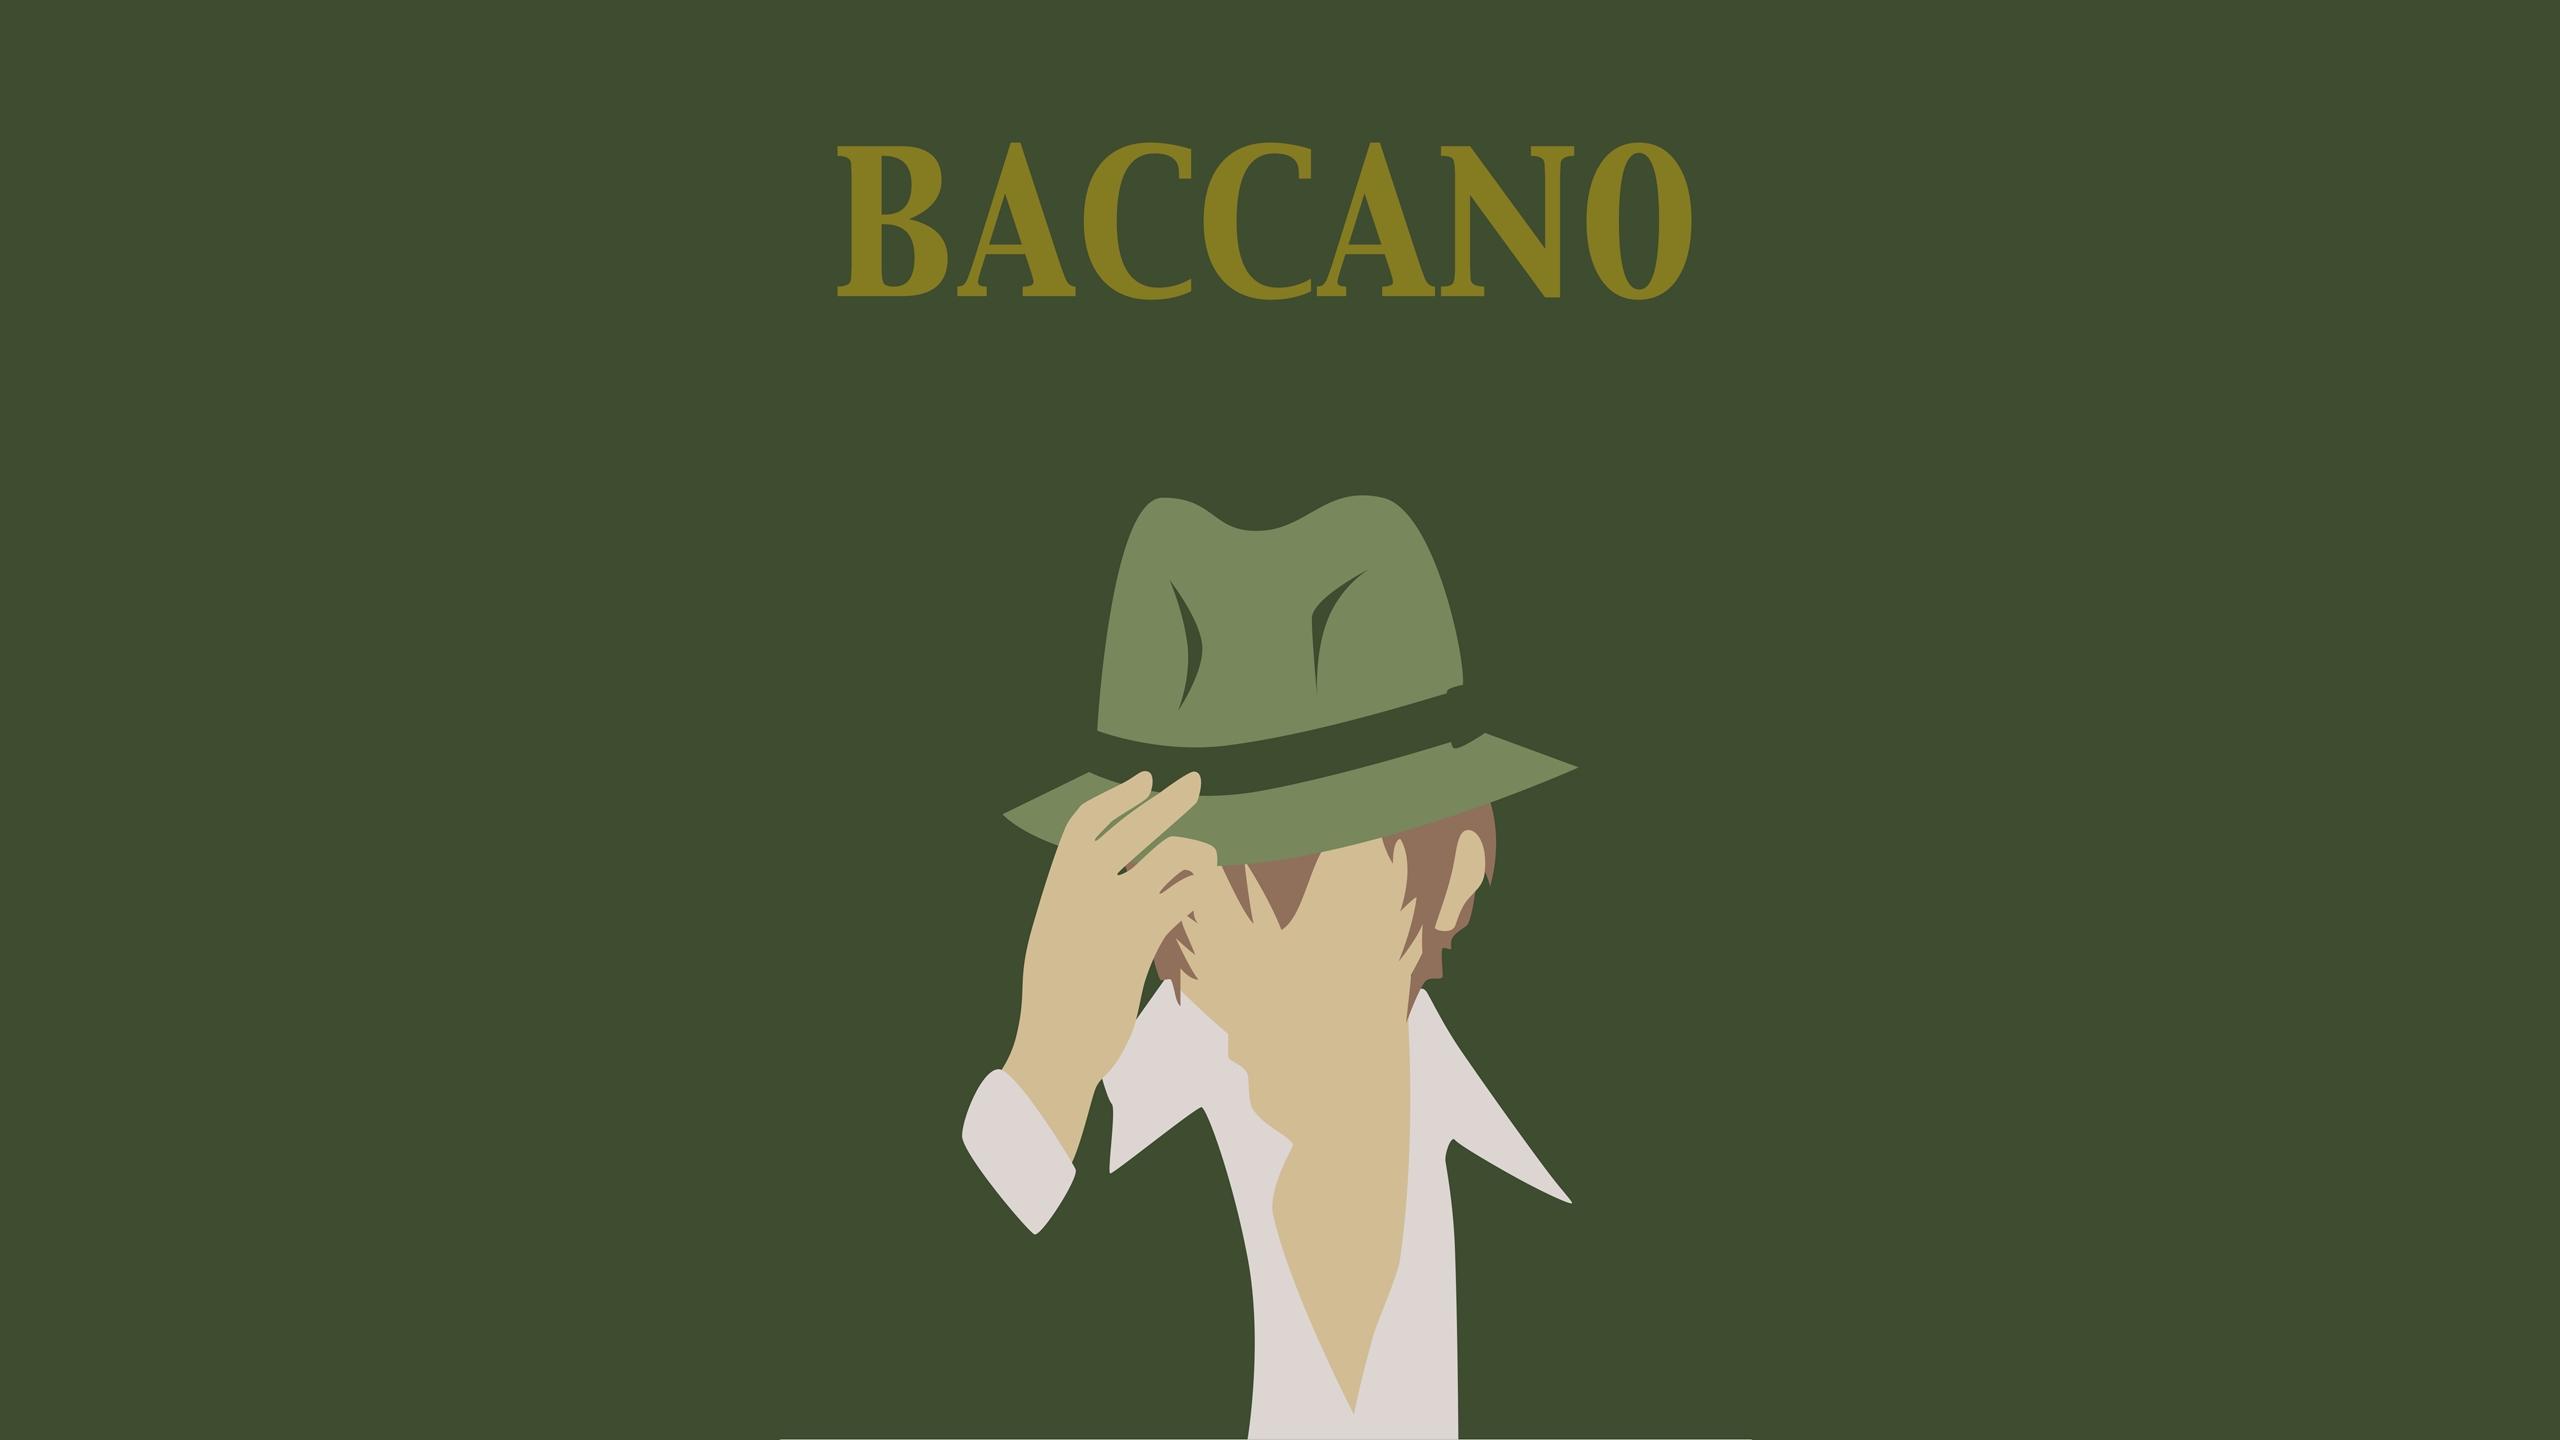 baccano download wallpaper